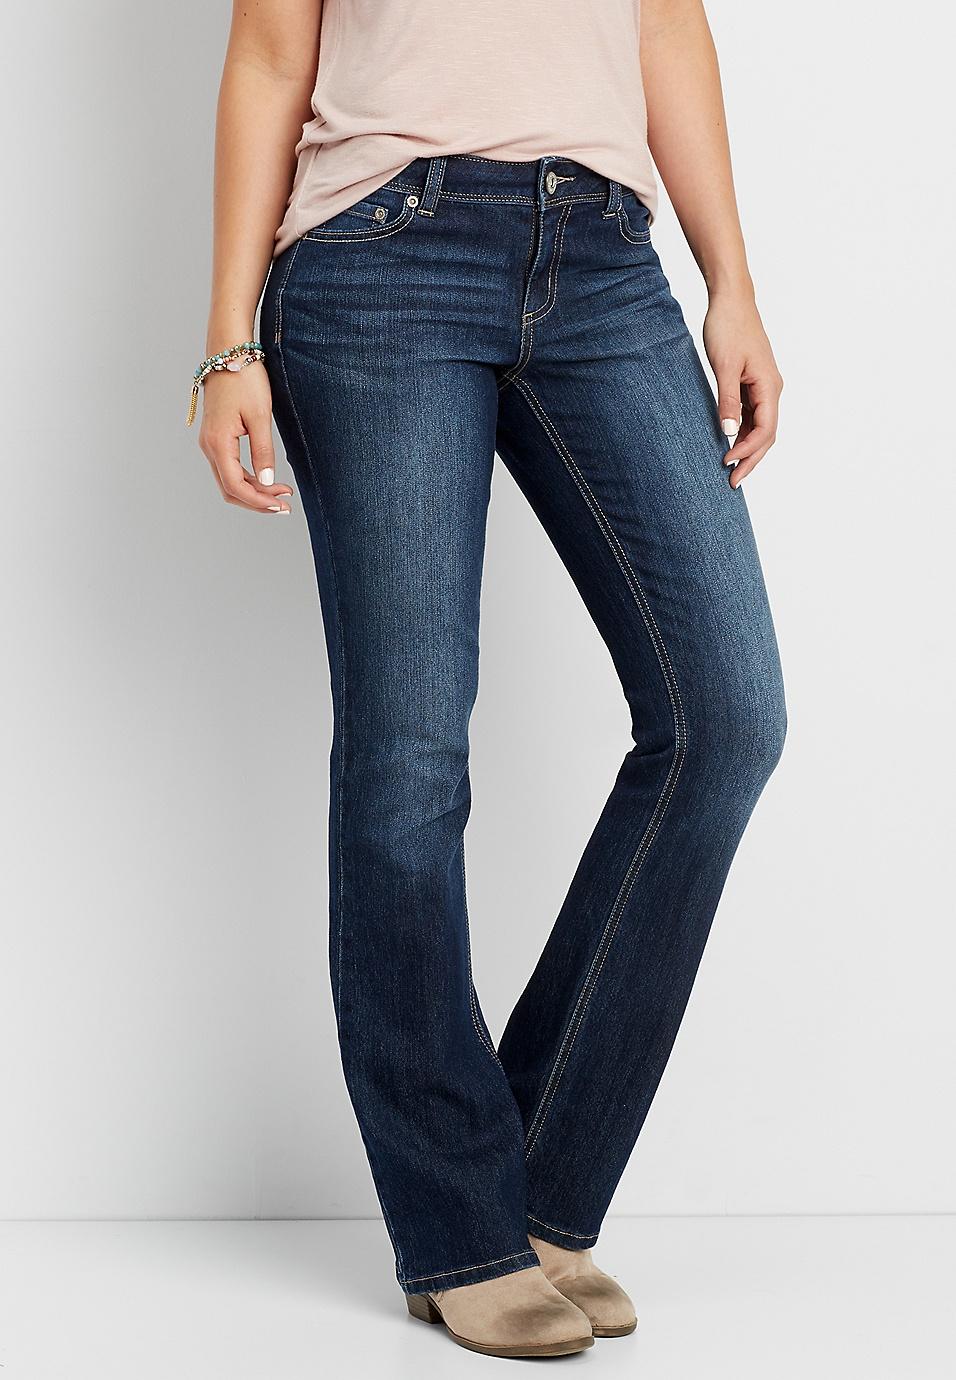 defa711bc5b DenimFlex™ dark wash bootcut jeans